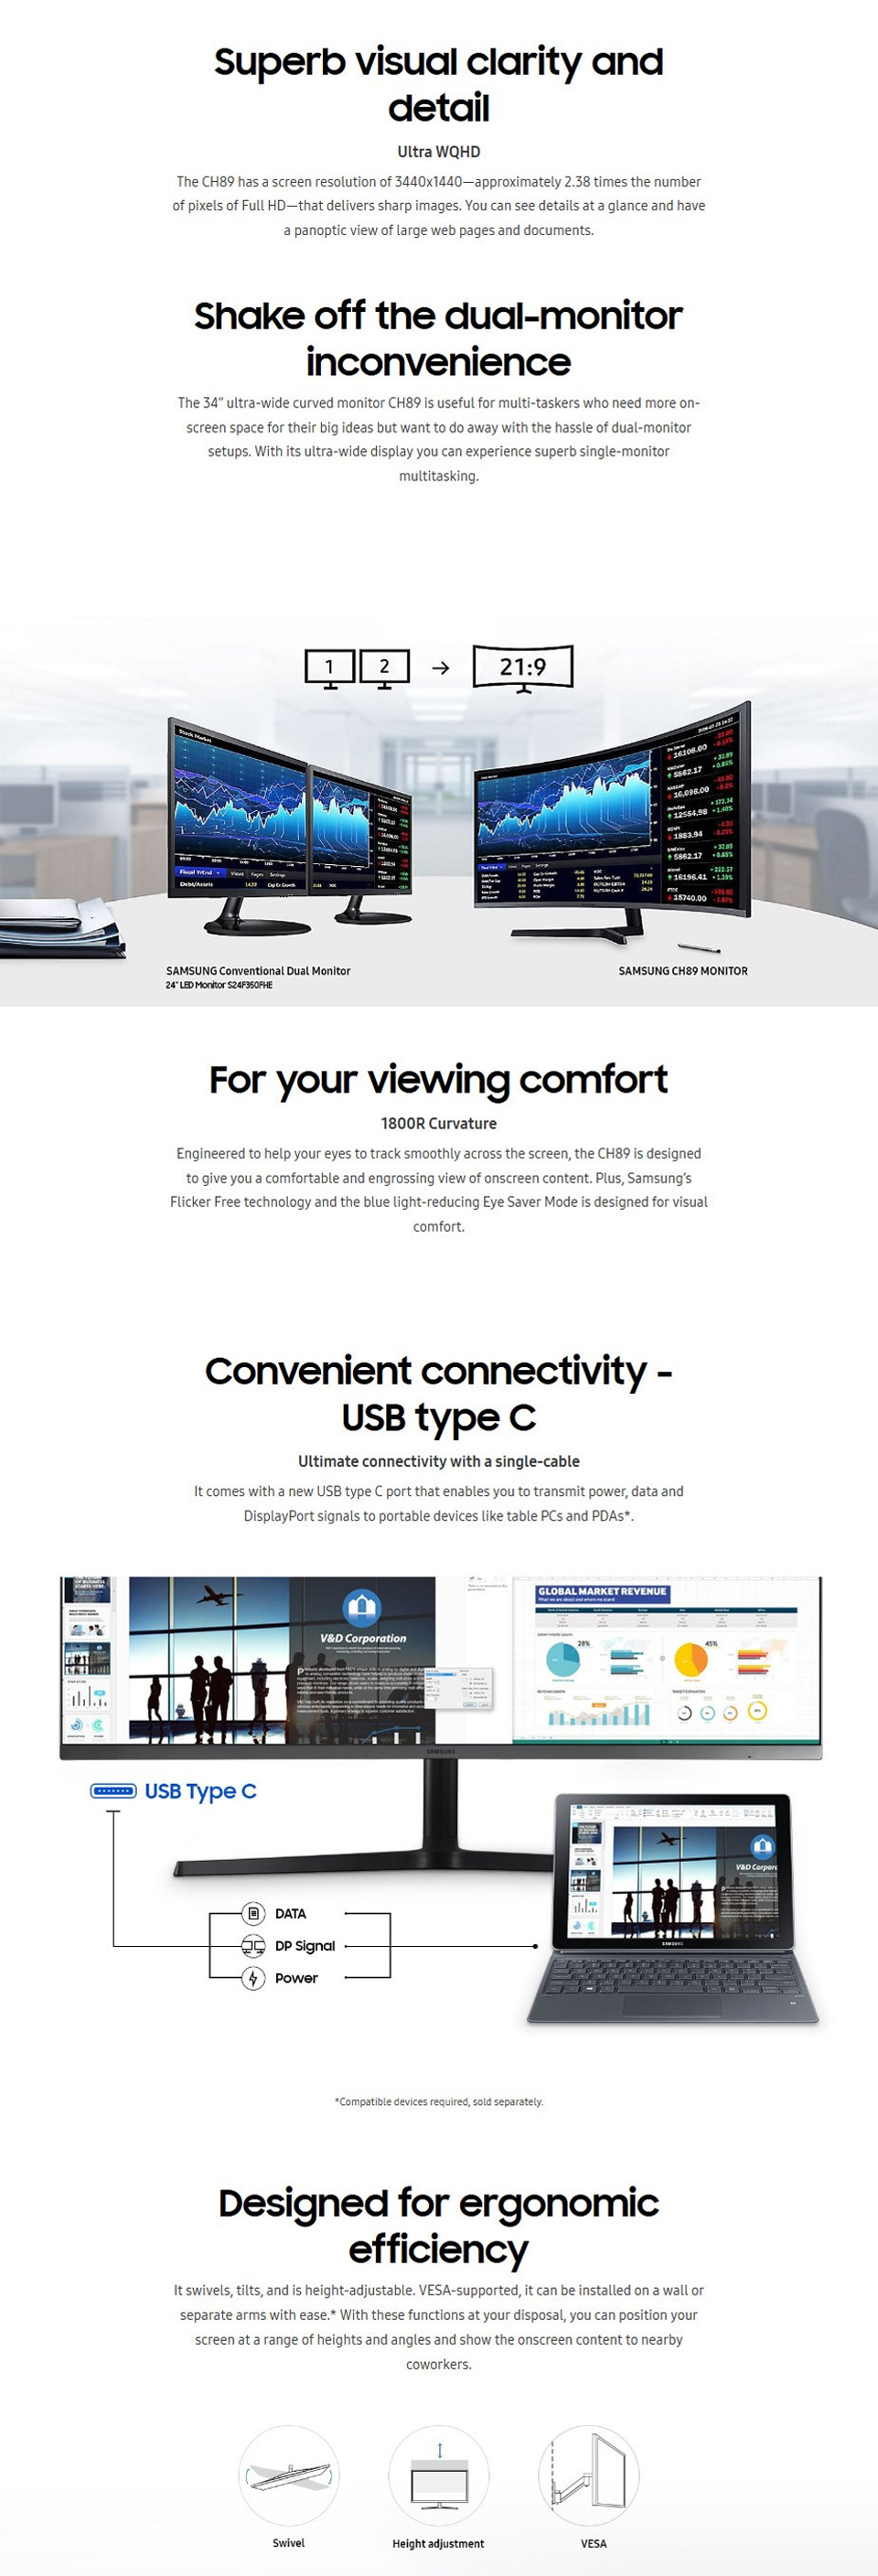 Samsung CH89 UWQHD 100Hz FreeSync Curved USB-C 34in Monitor features